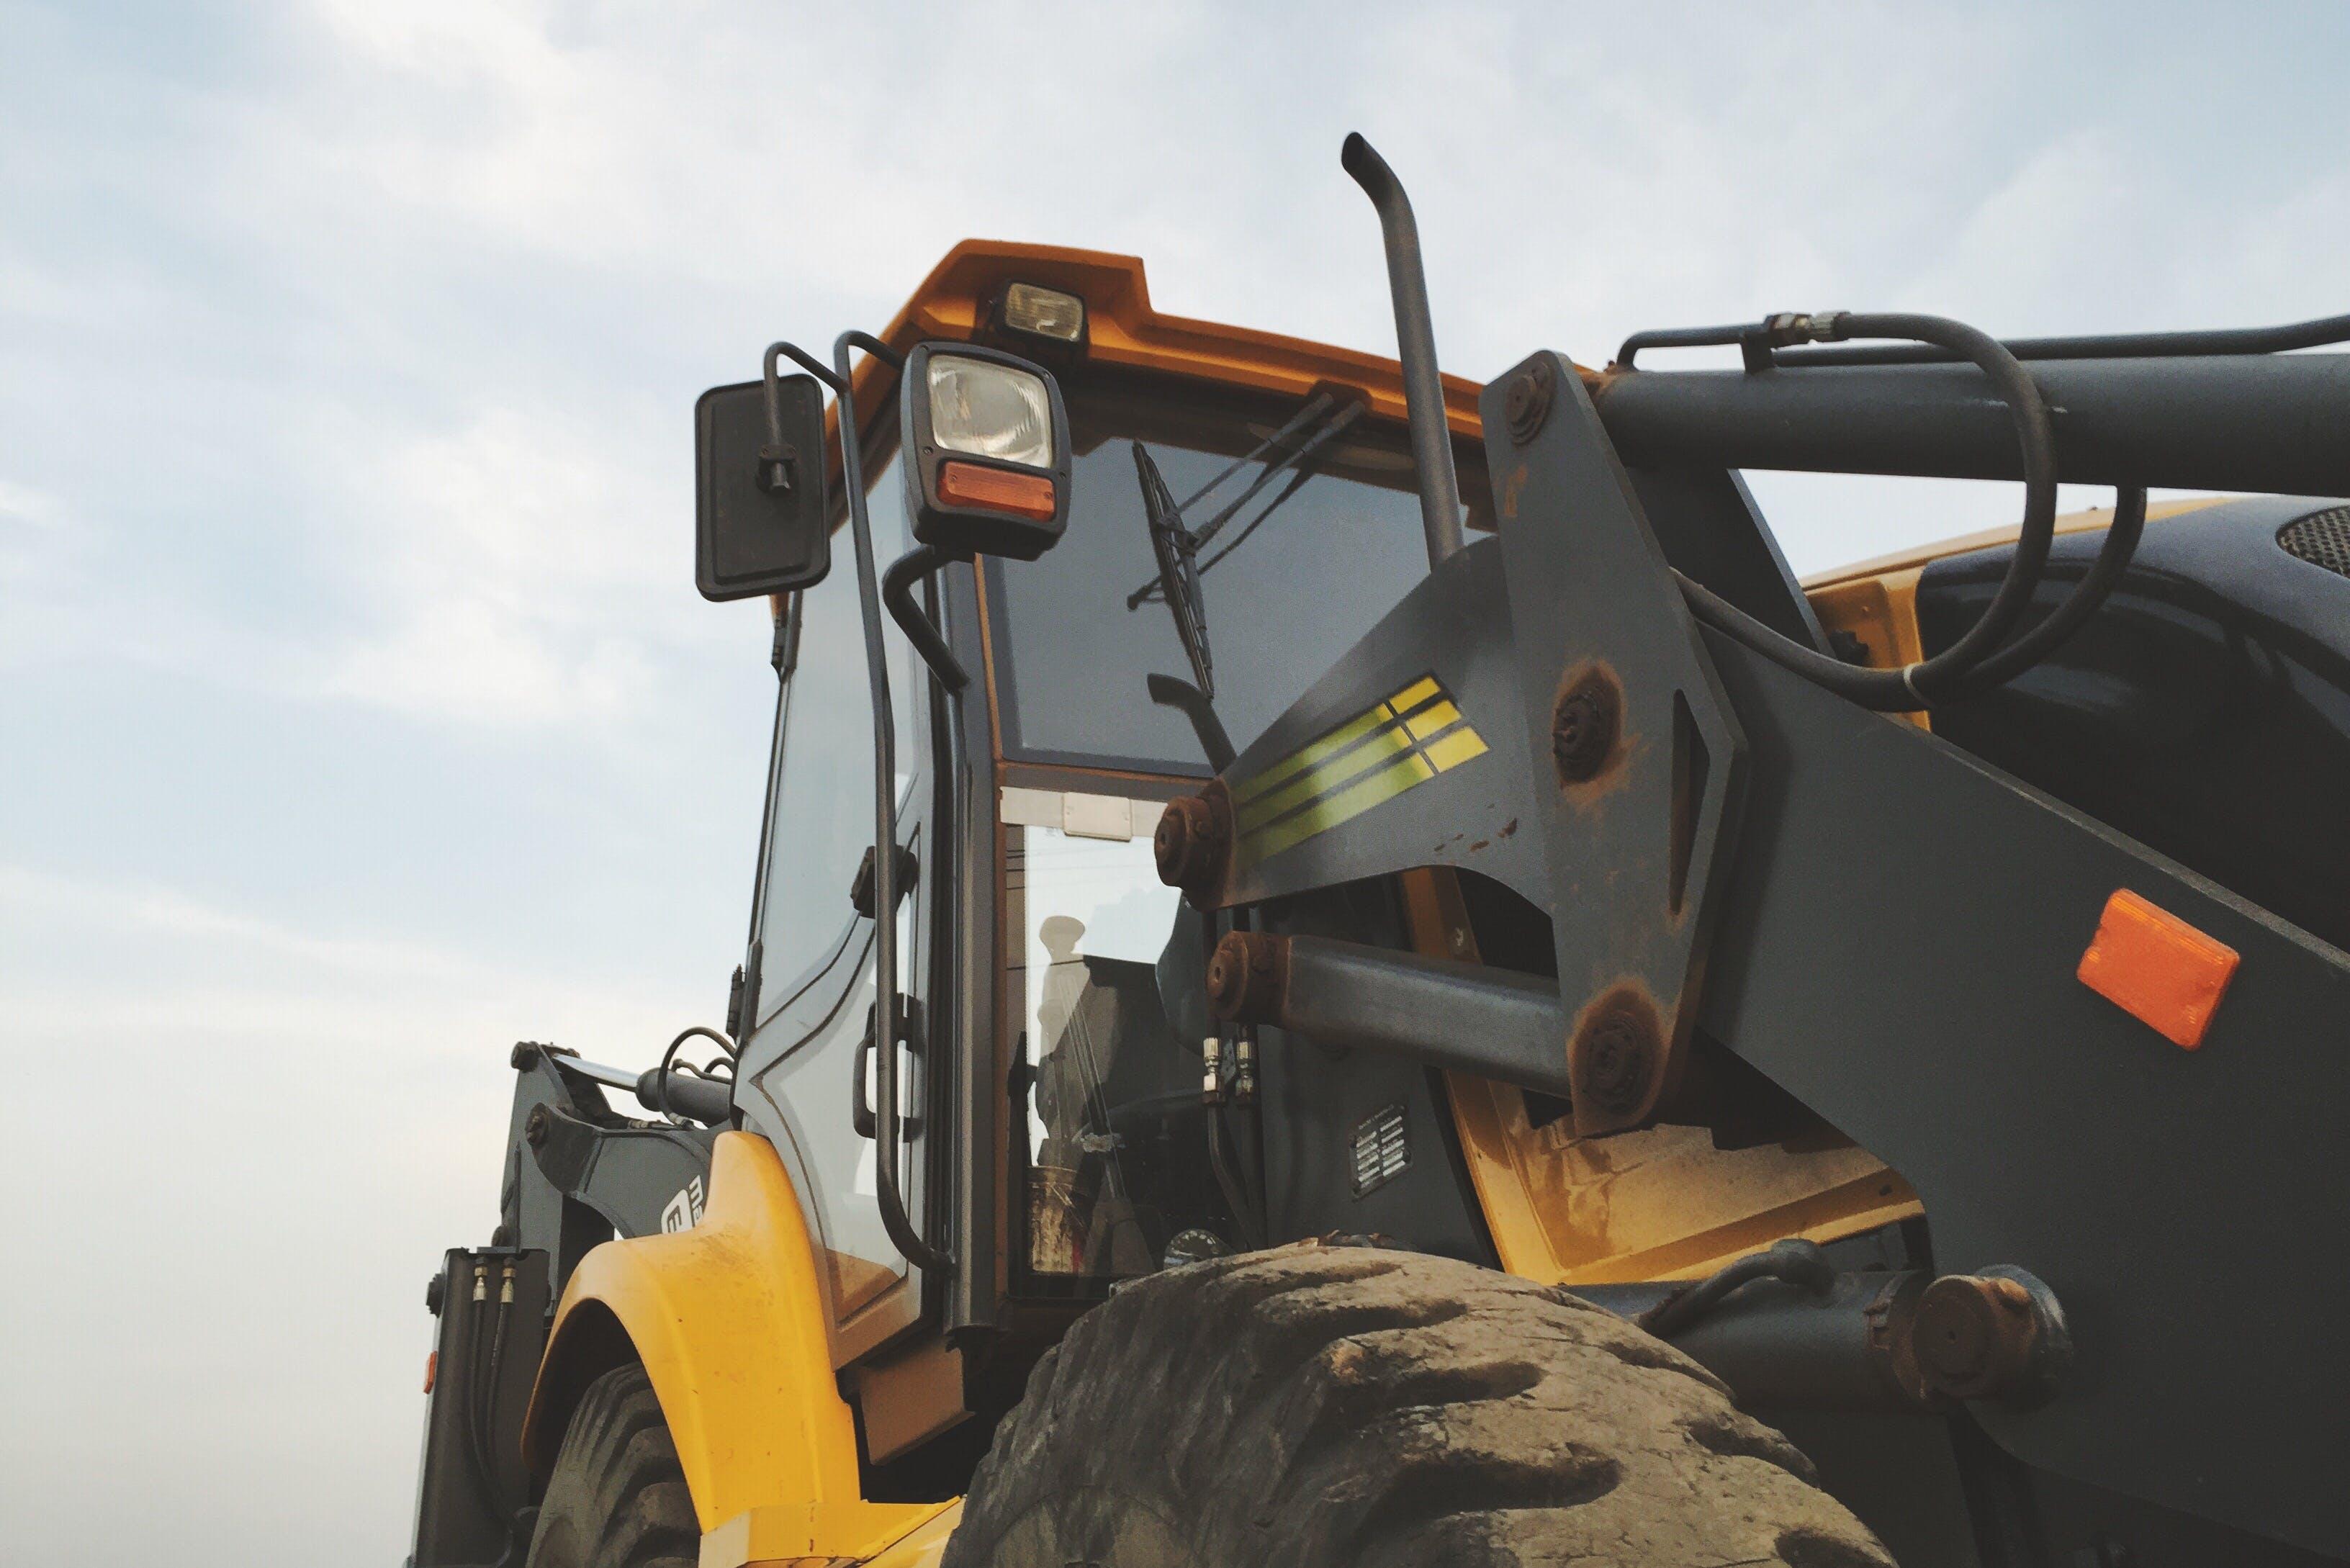 bagger, bulldozer, constructing